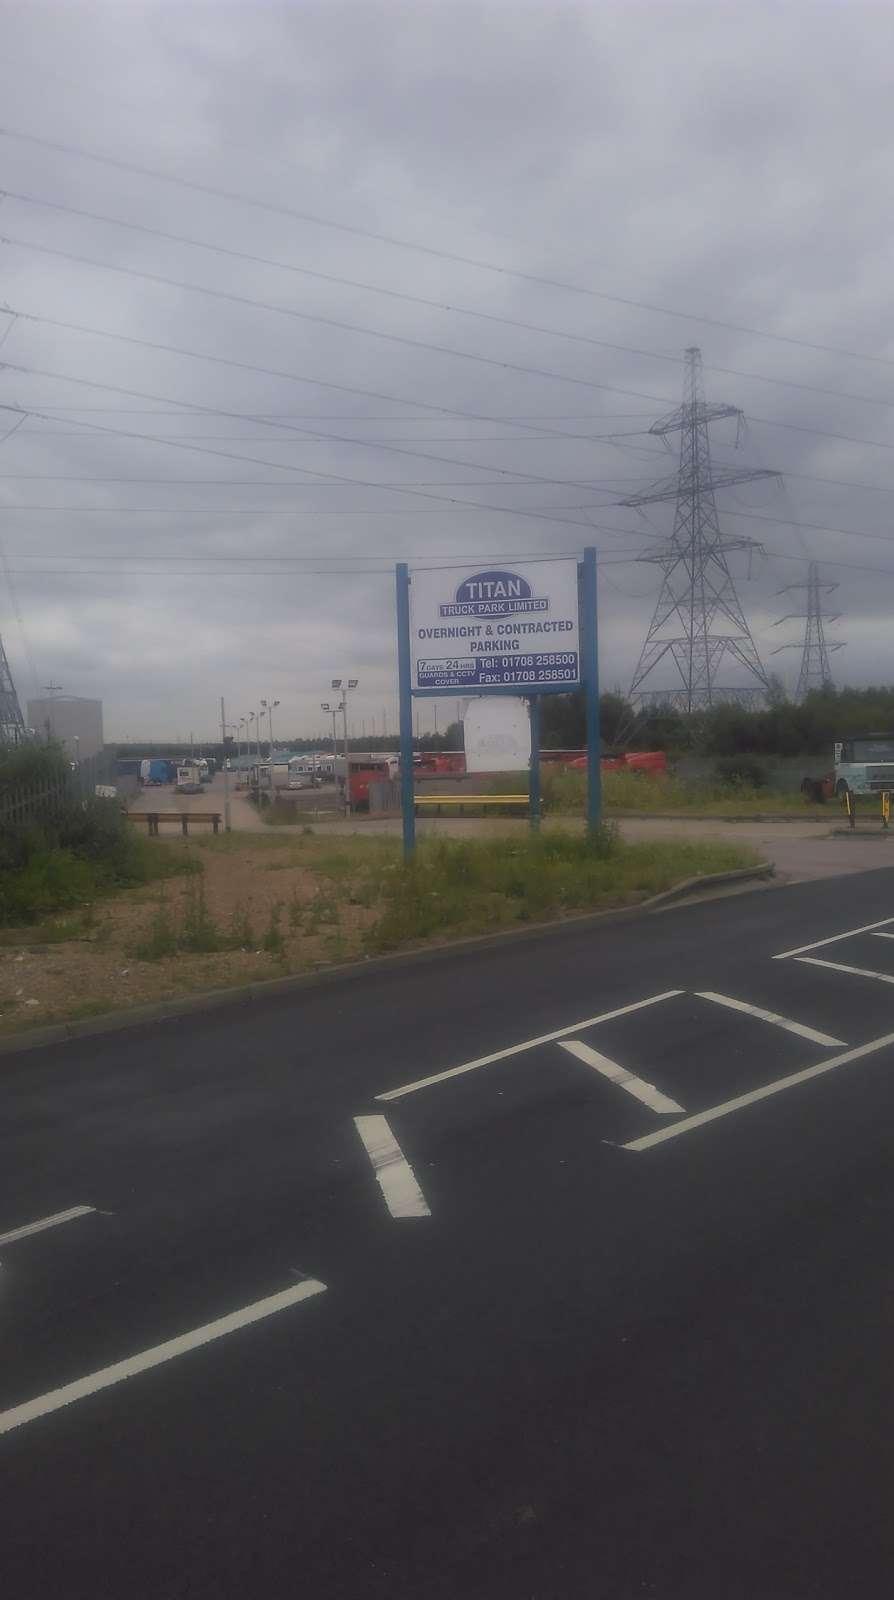 Titan Truck Park - parking    Photo 7 of 7   Address: Stoneness Rd, Grays RM20 3AG, UK   Phone: 01708 258500